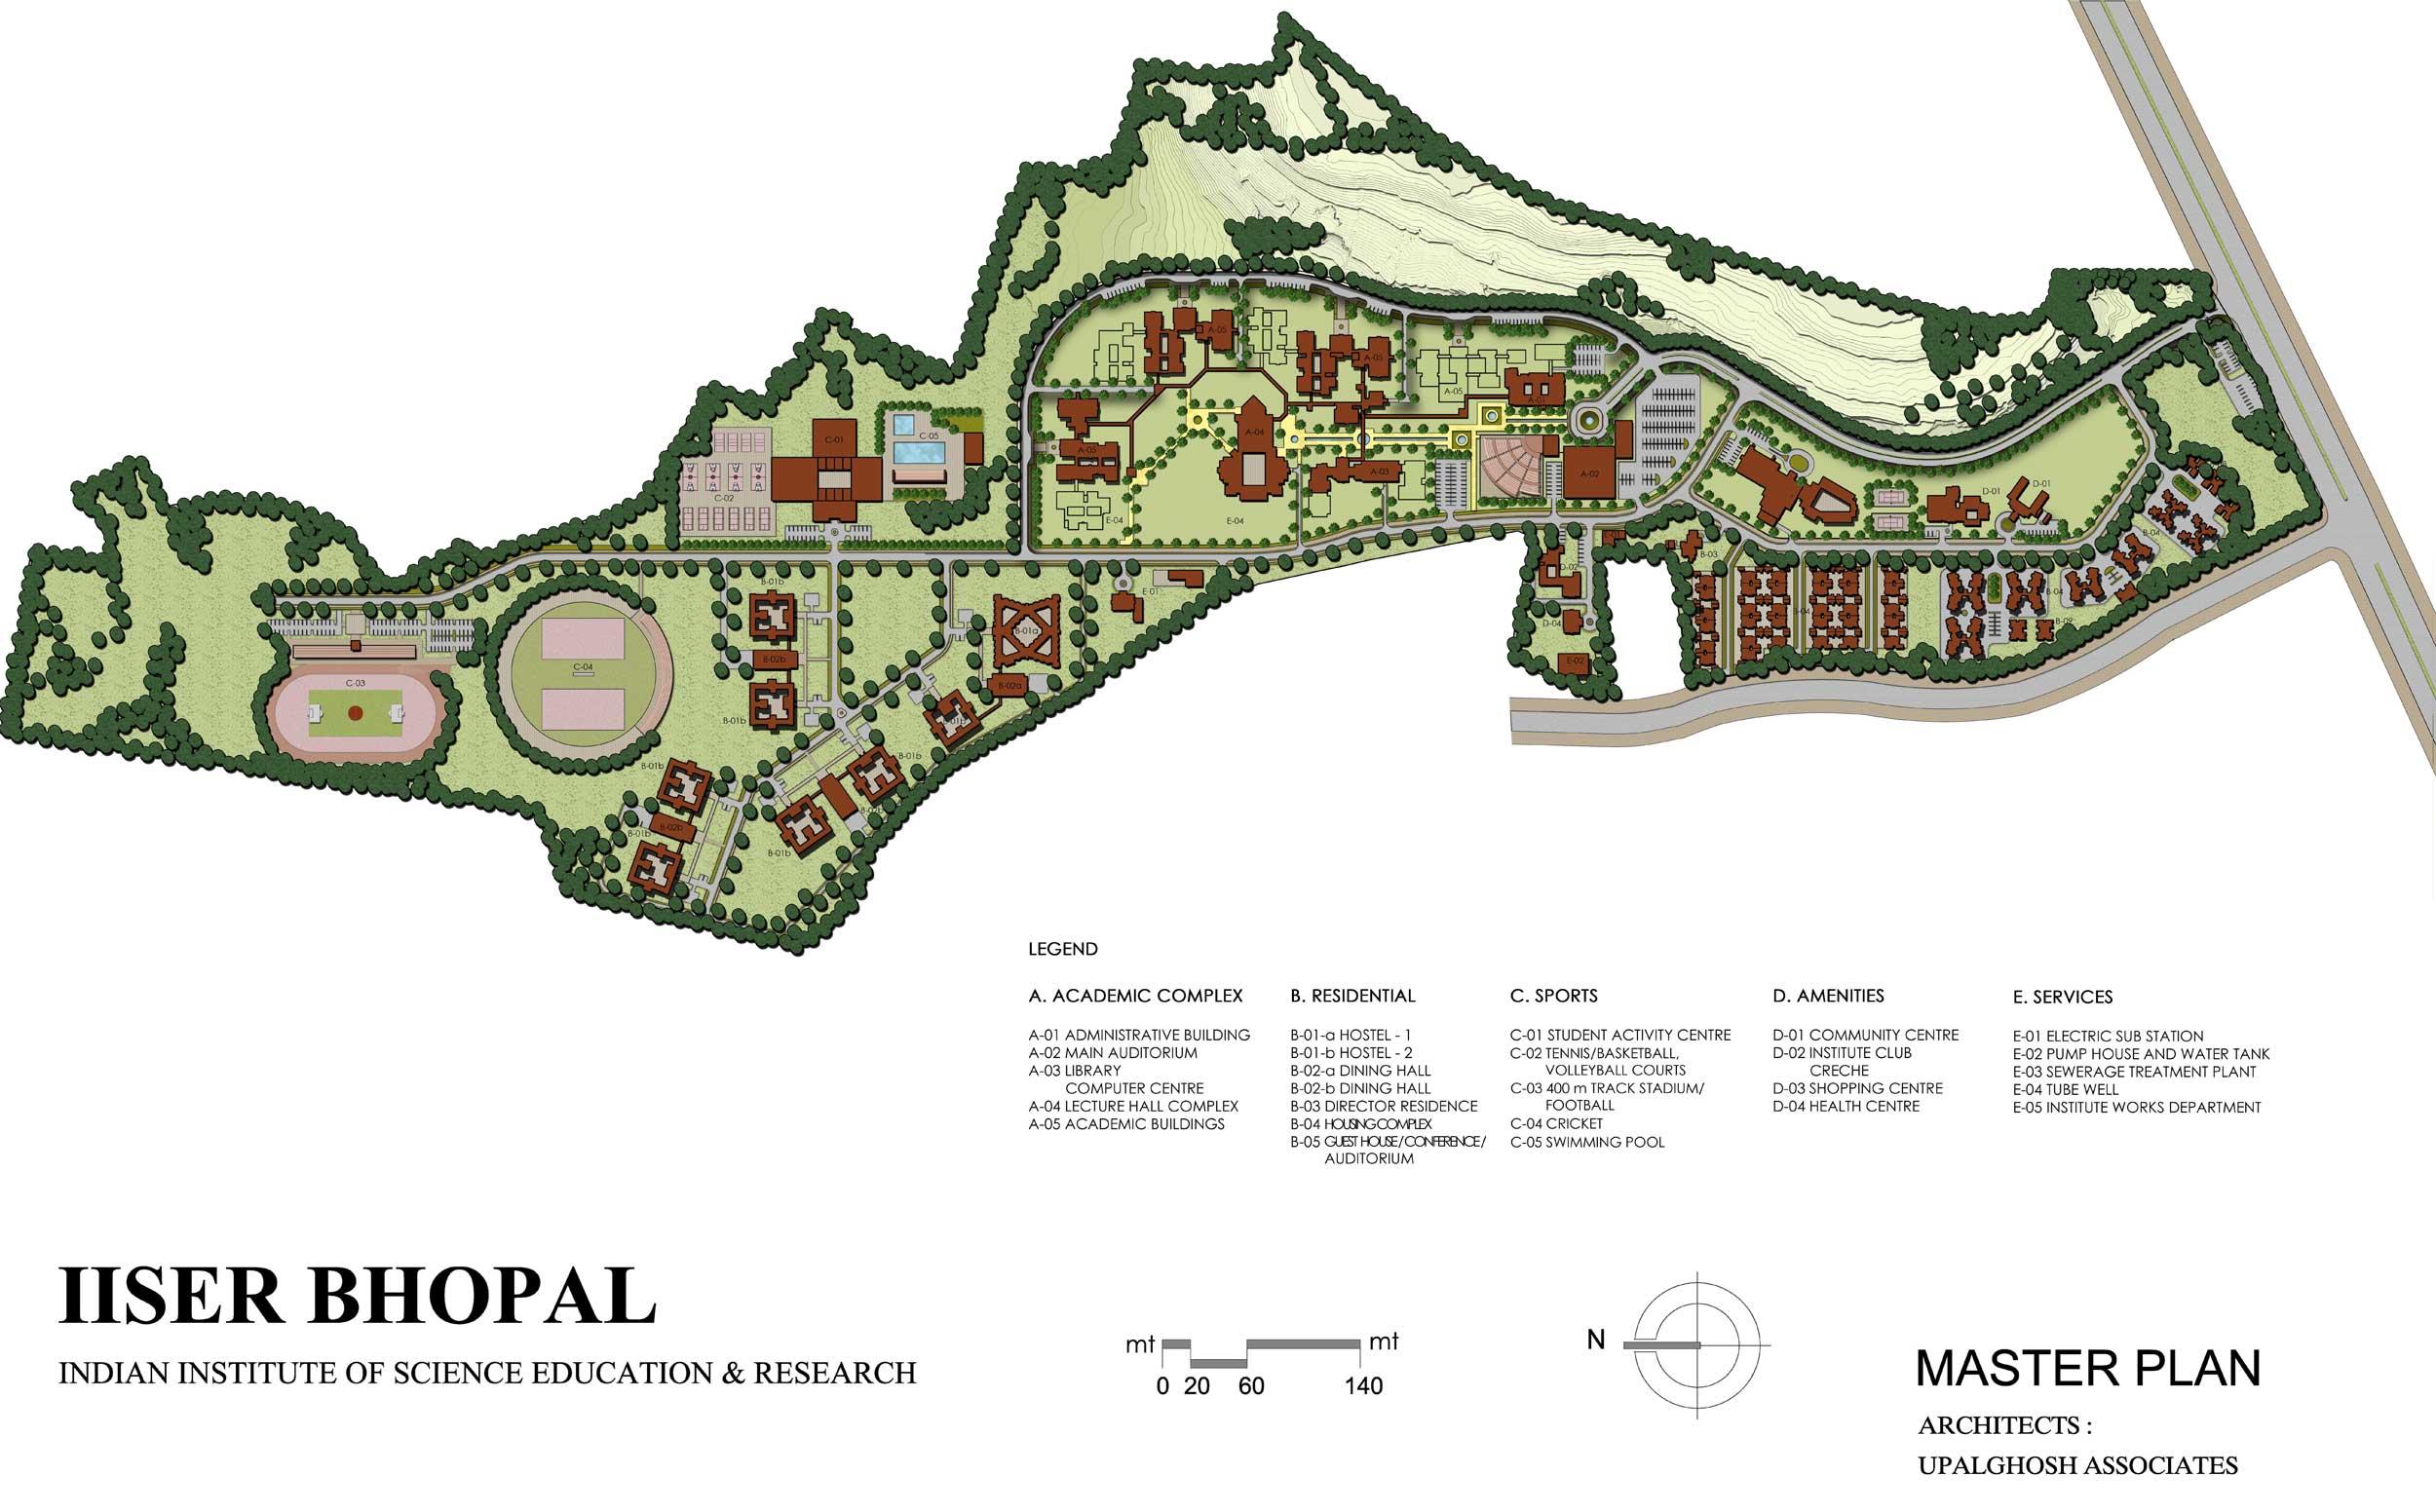 IISER Bhopal Master Plan